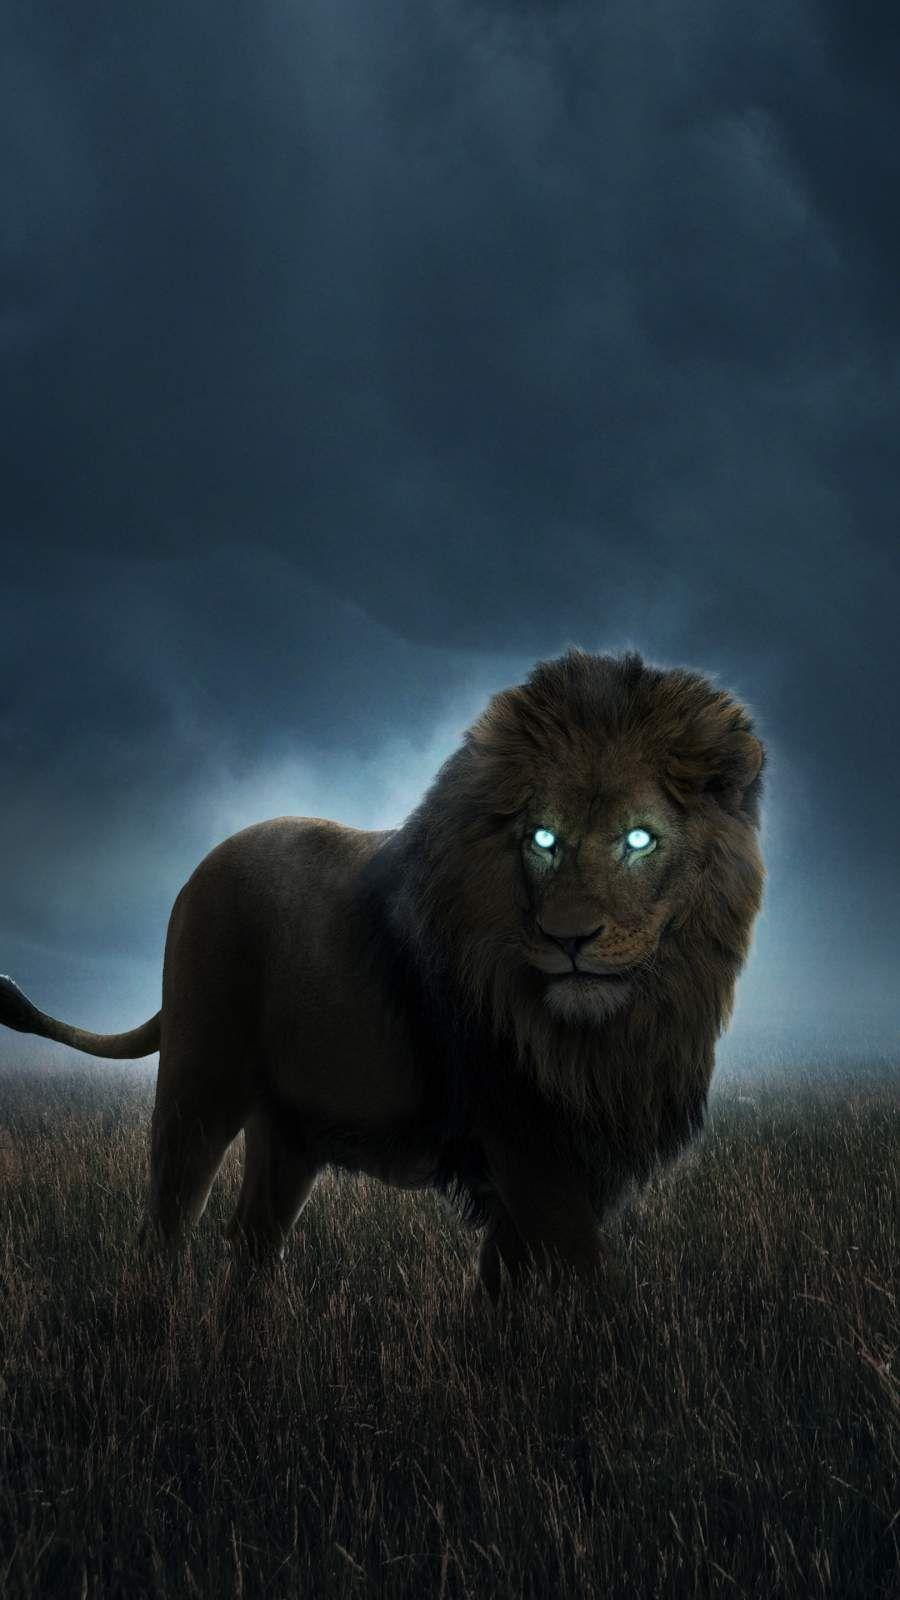 Hunting Lion Iphone Wallpaper Animal Wallpaper Iphone Wallpaper